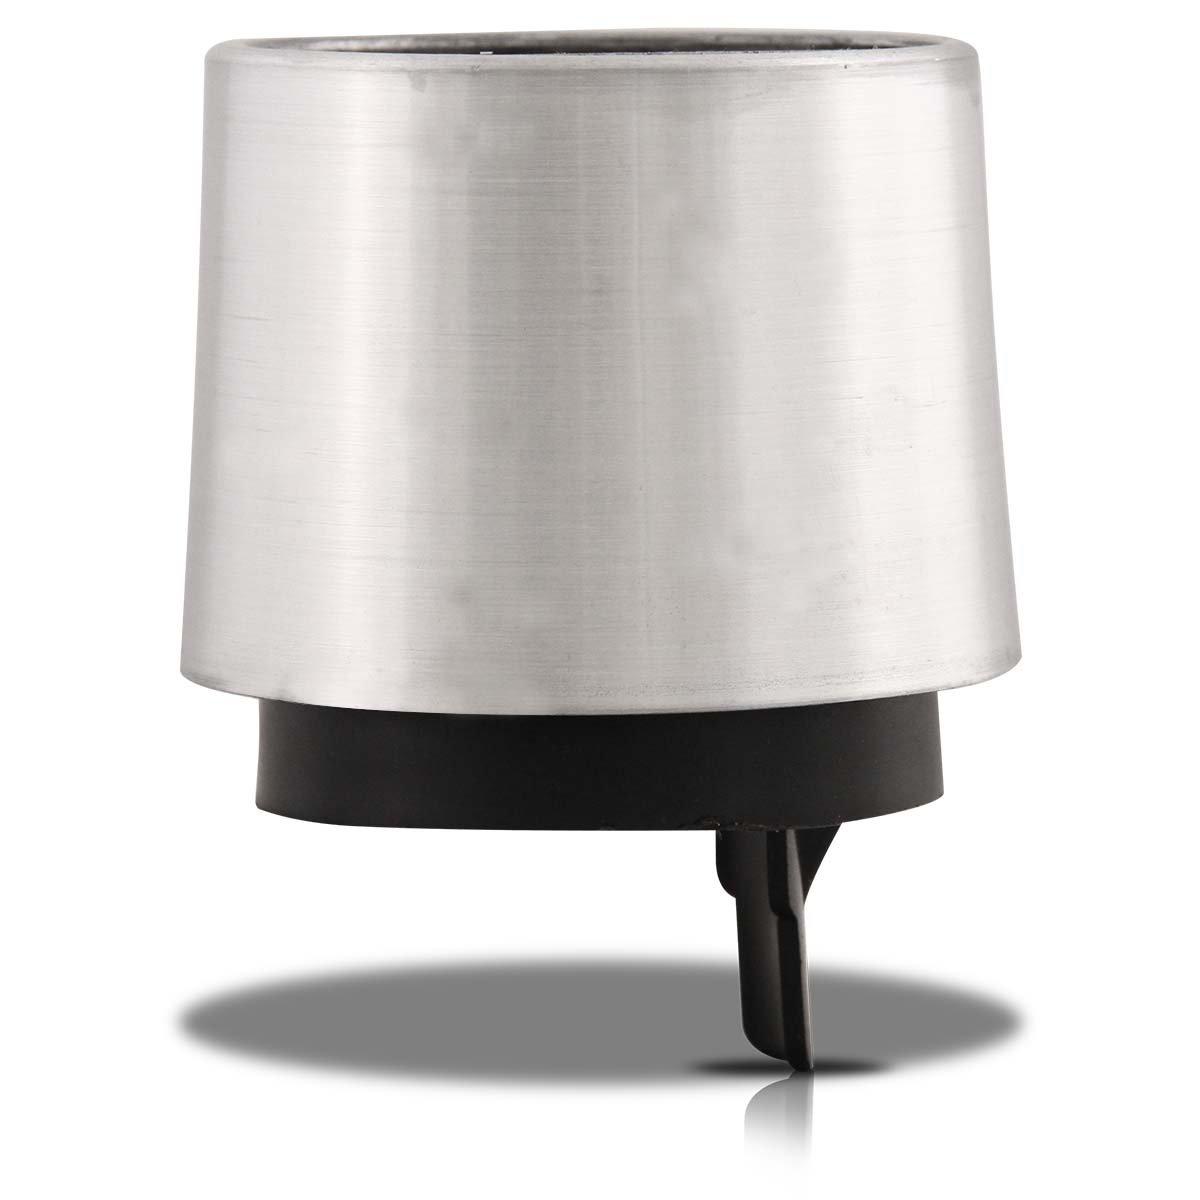 Cubo Alumínio Celta Buzina Lateral Na Chave de Seta